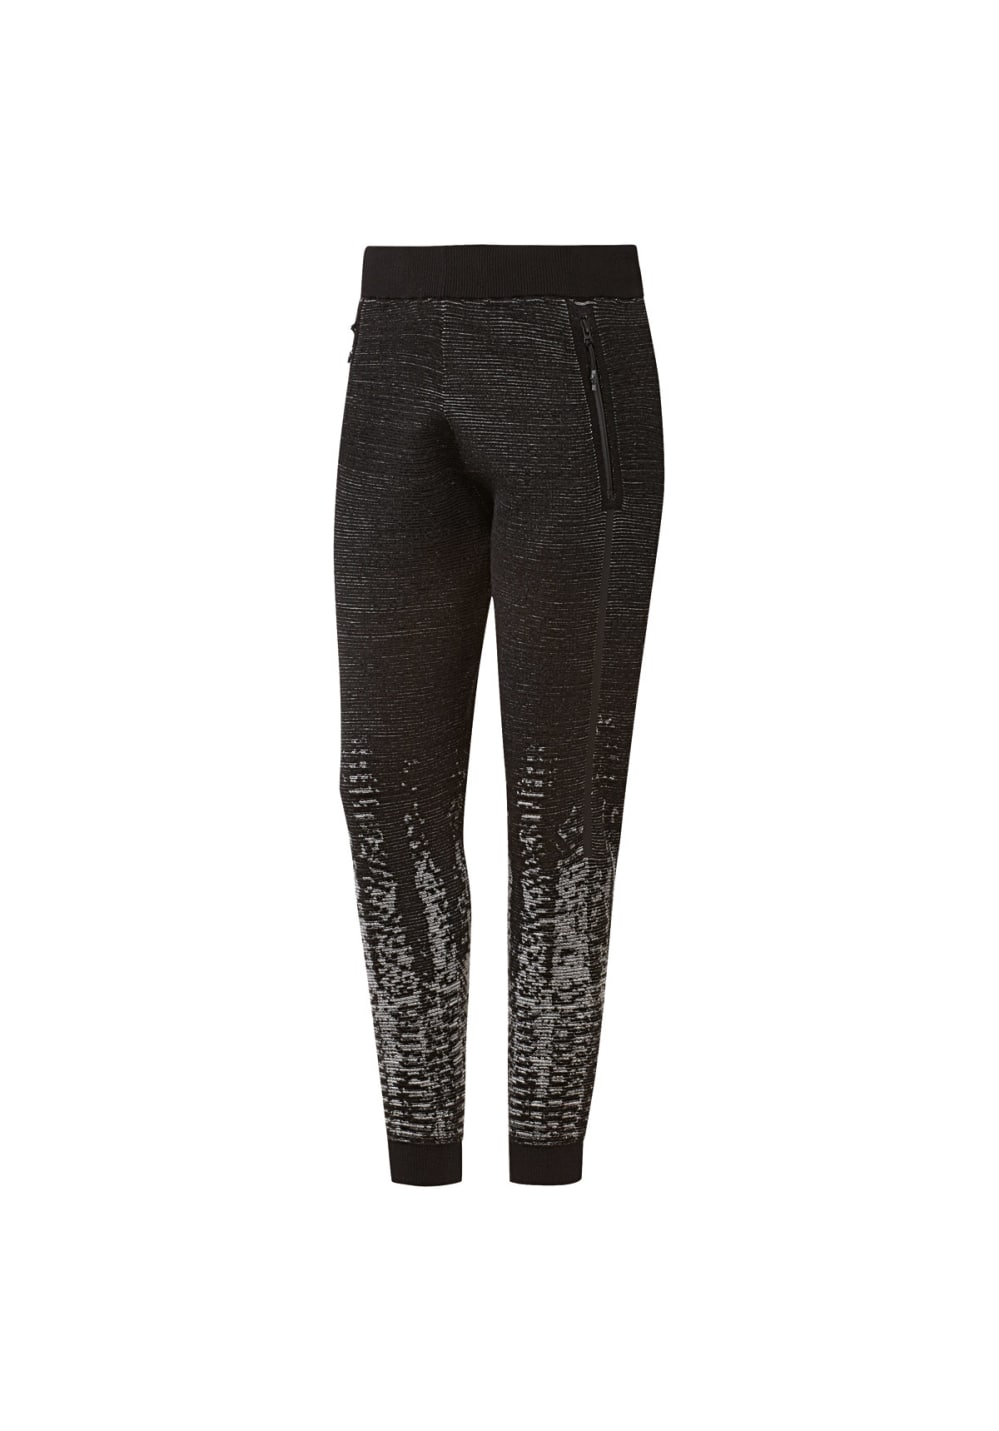 adidas adidas Z.N.E. Pulse Pants - Laufhosen für Damen - Schwarz, Gr. XS